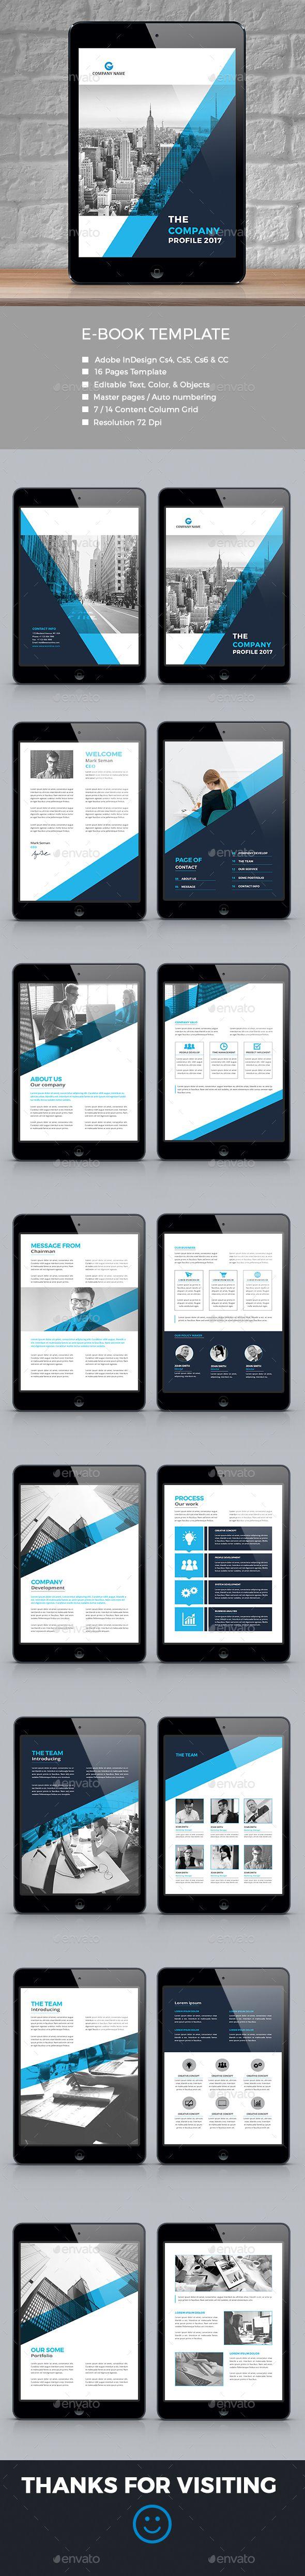 Corporate E Book Template InDesign INDD 586 best